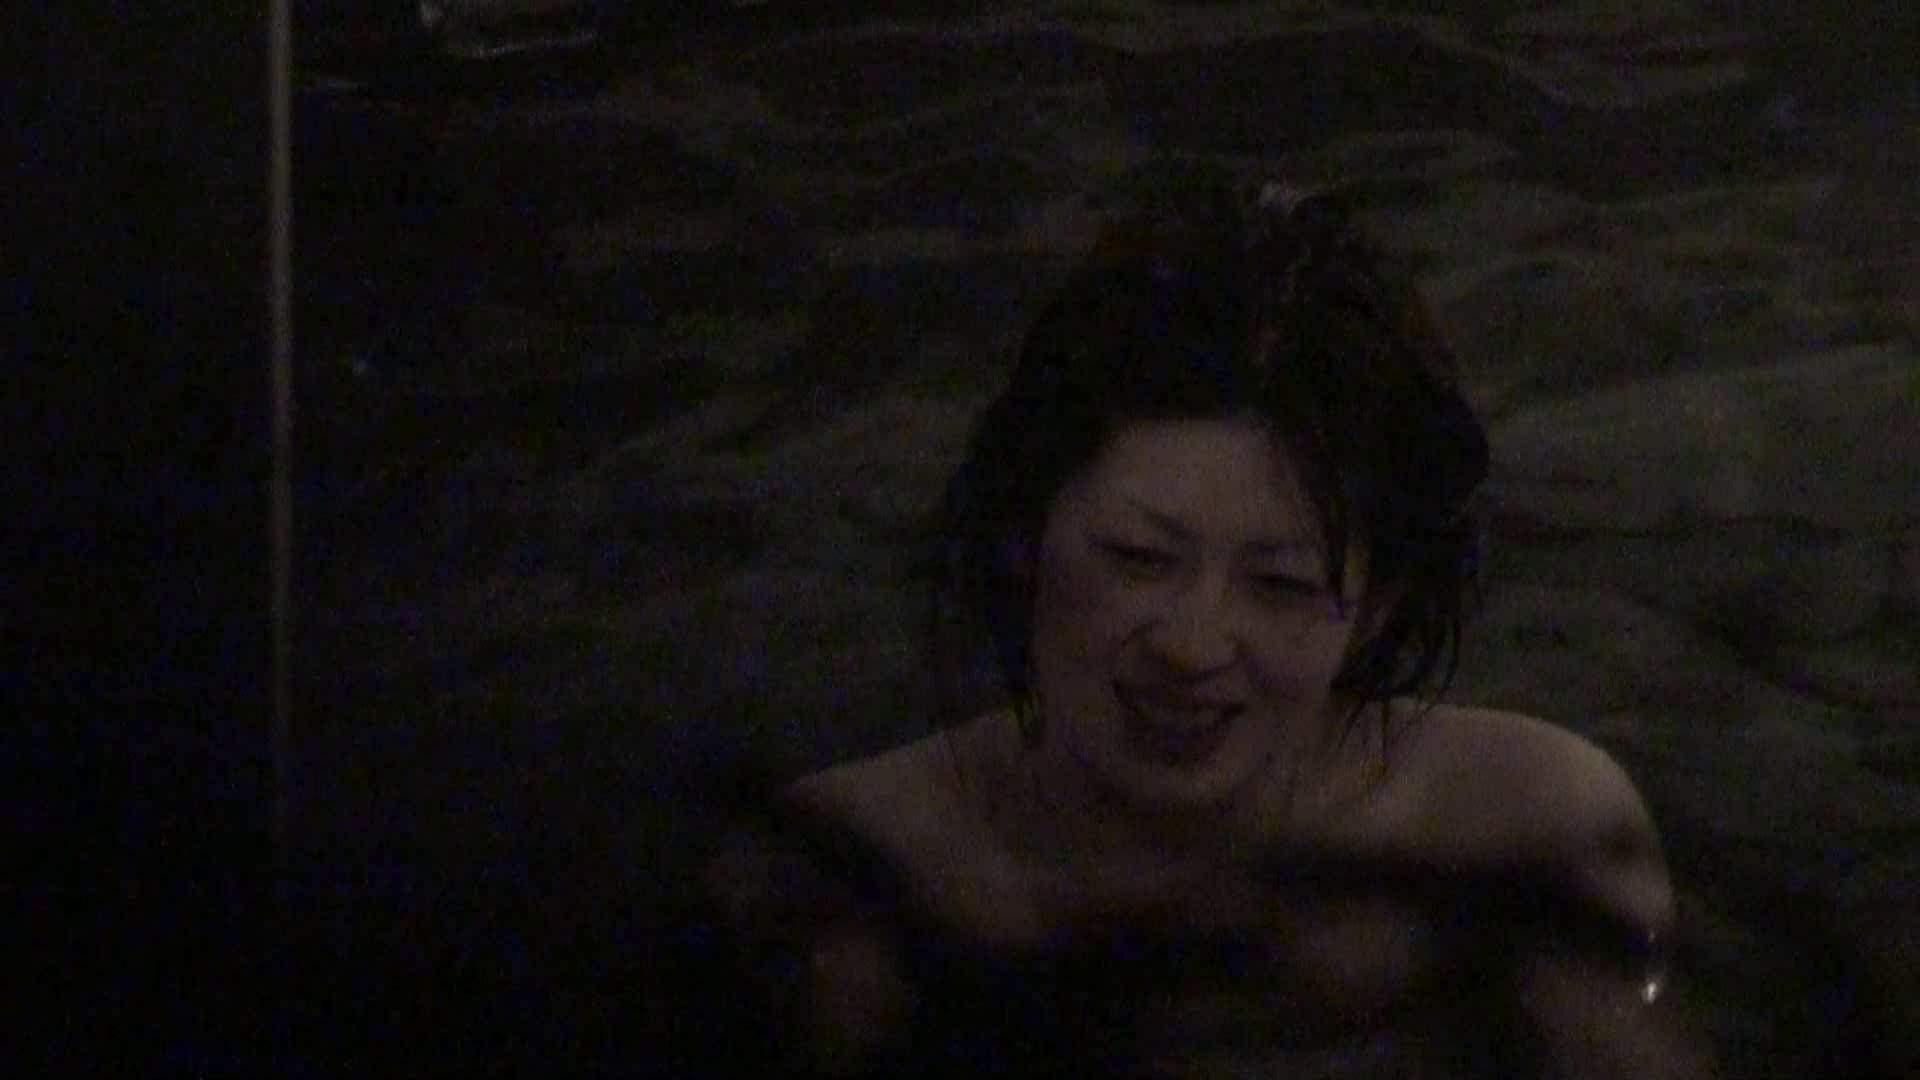 Aquaな露天風呂Vol.376 0  47連発 14